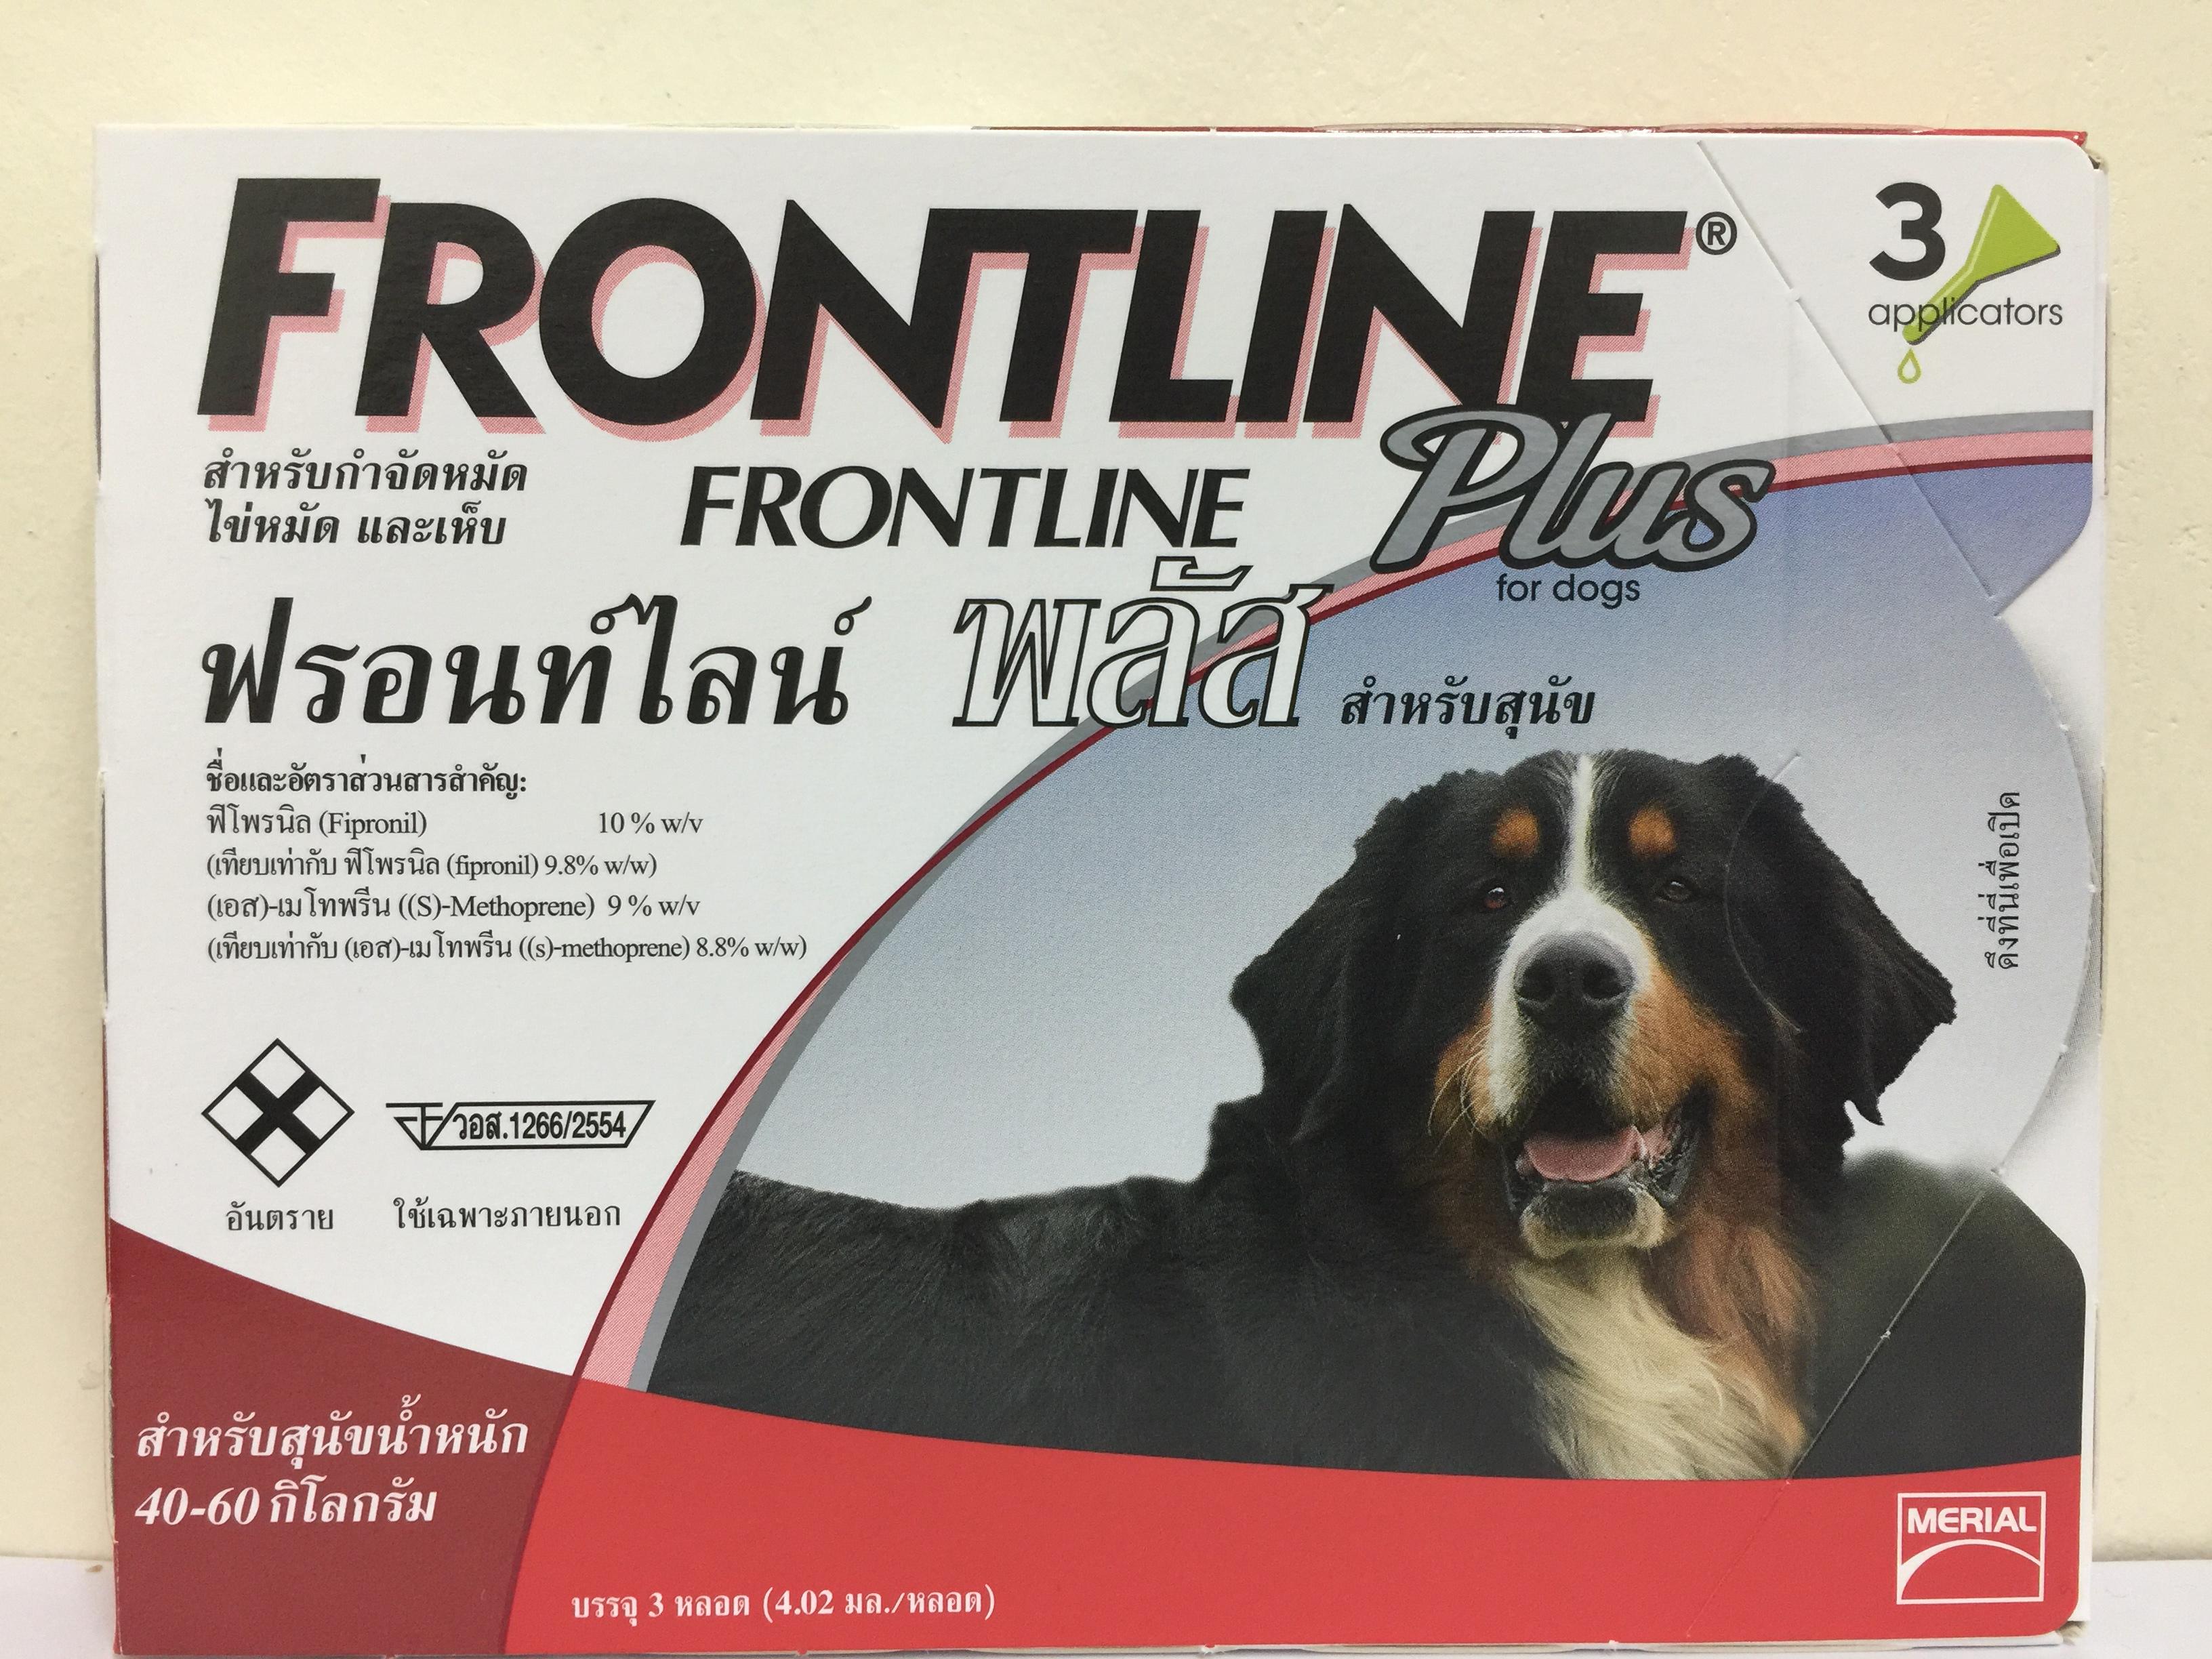 Frontline Plus for dogs สุนัข น้ำหนัก 40-60 kg บรรจุ 3 หลอด ( 1 box ) Exp.10/18